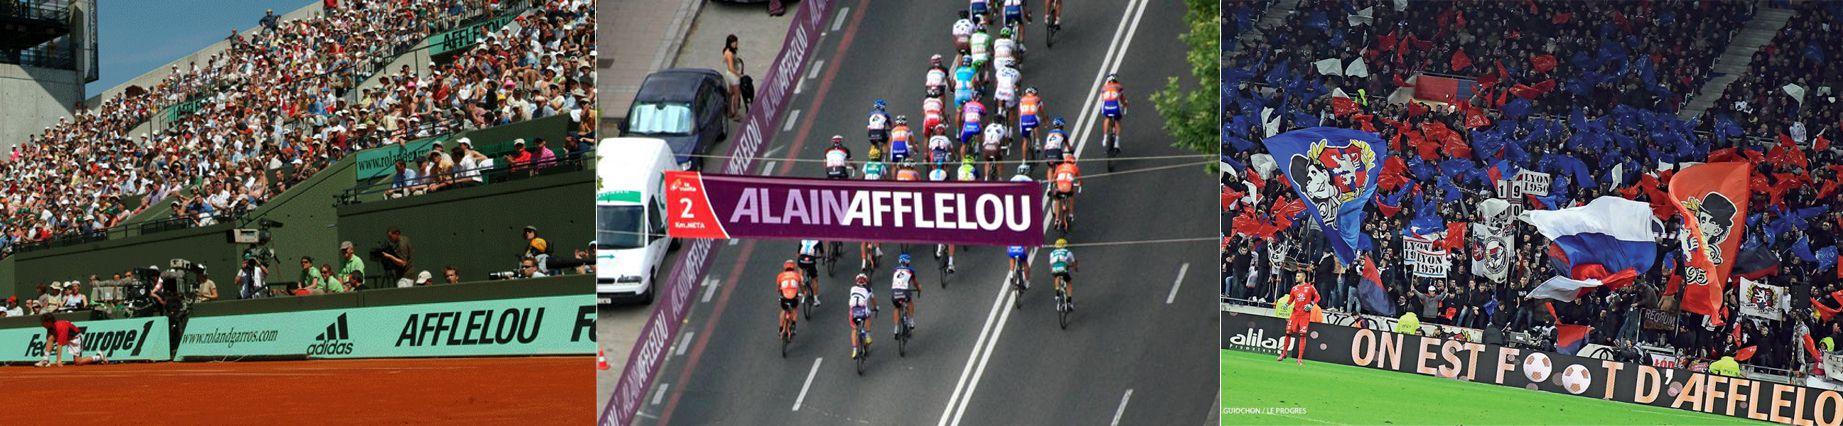 Afflelou soutient nos sportifs